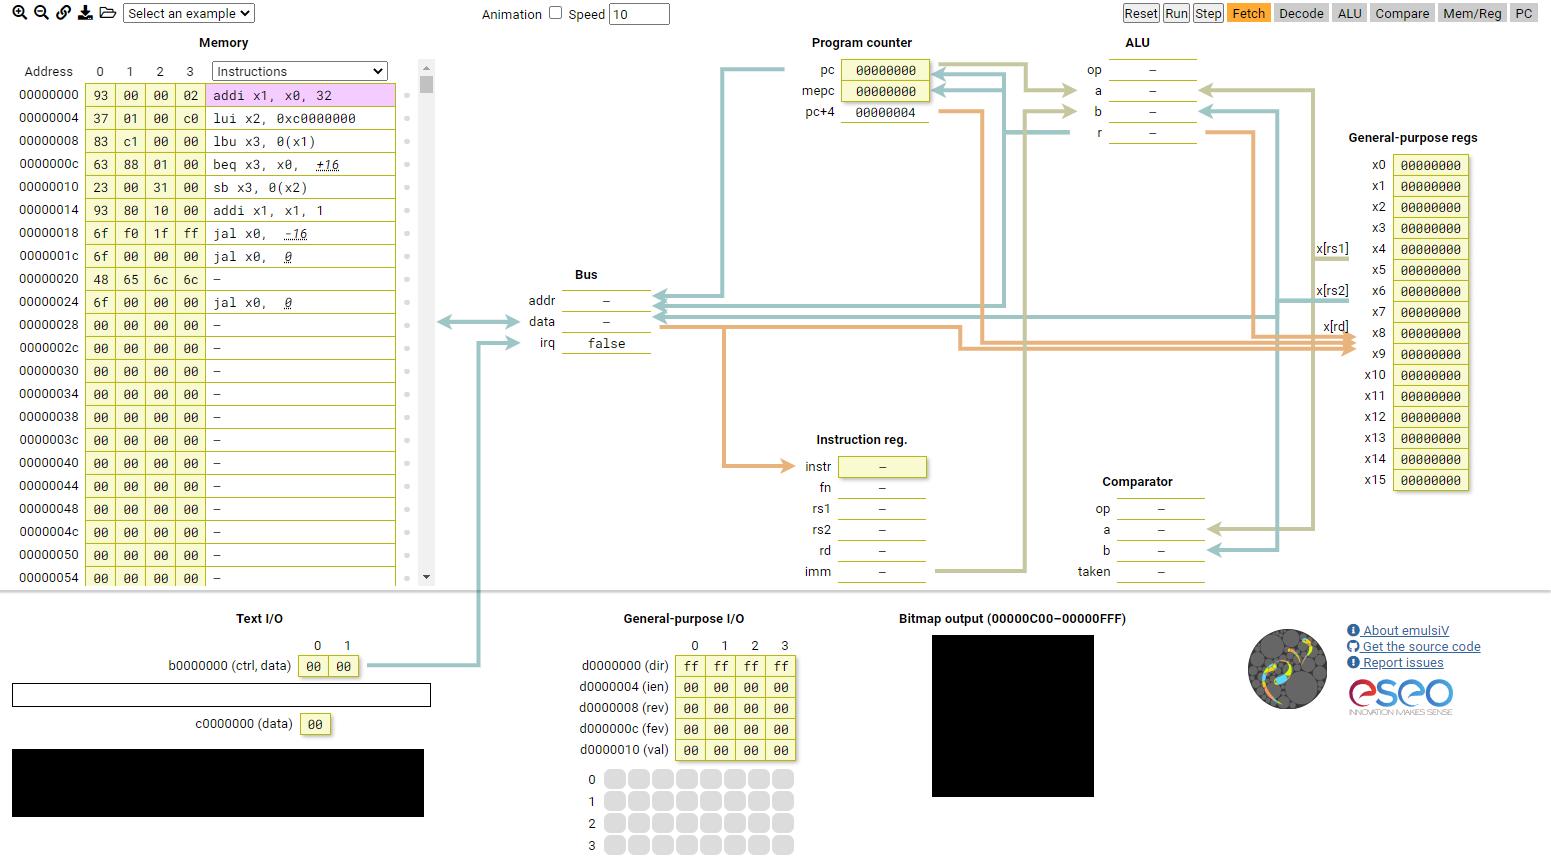 emulsiV RISC-V Simulator screenshot